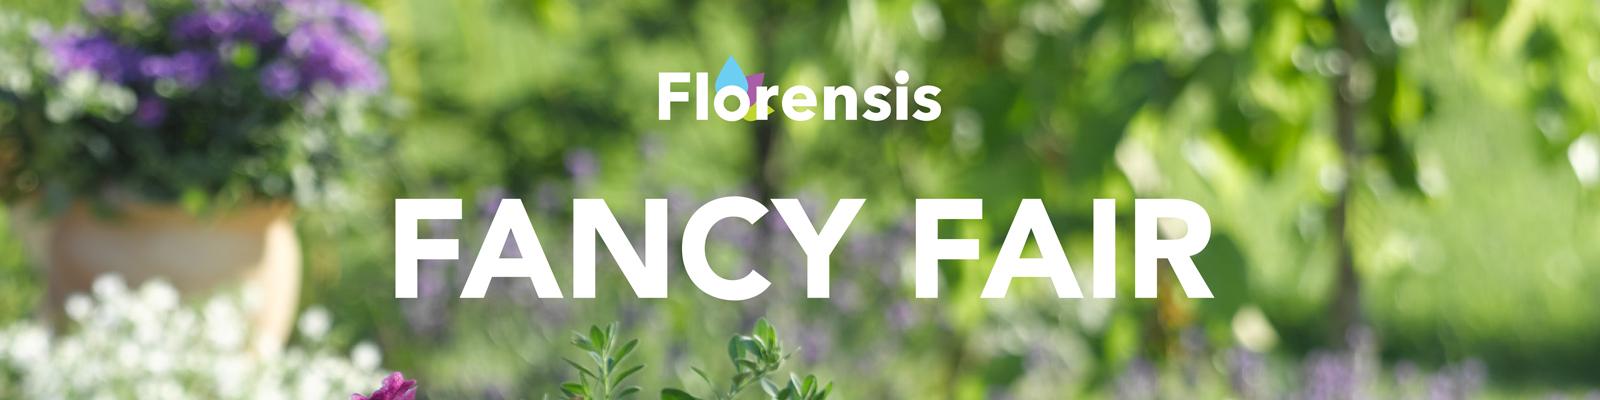 florensis-fancy-fair-banner